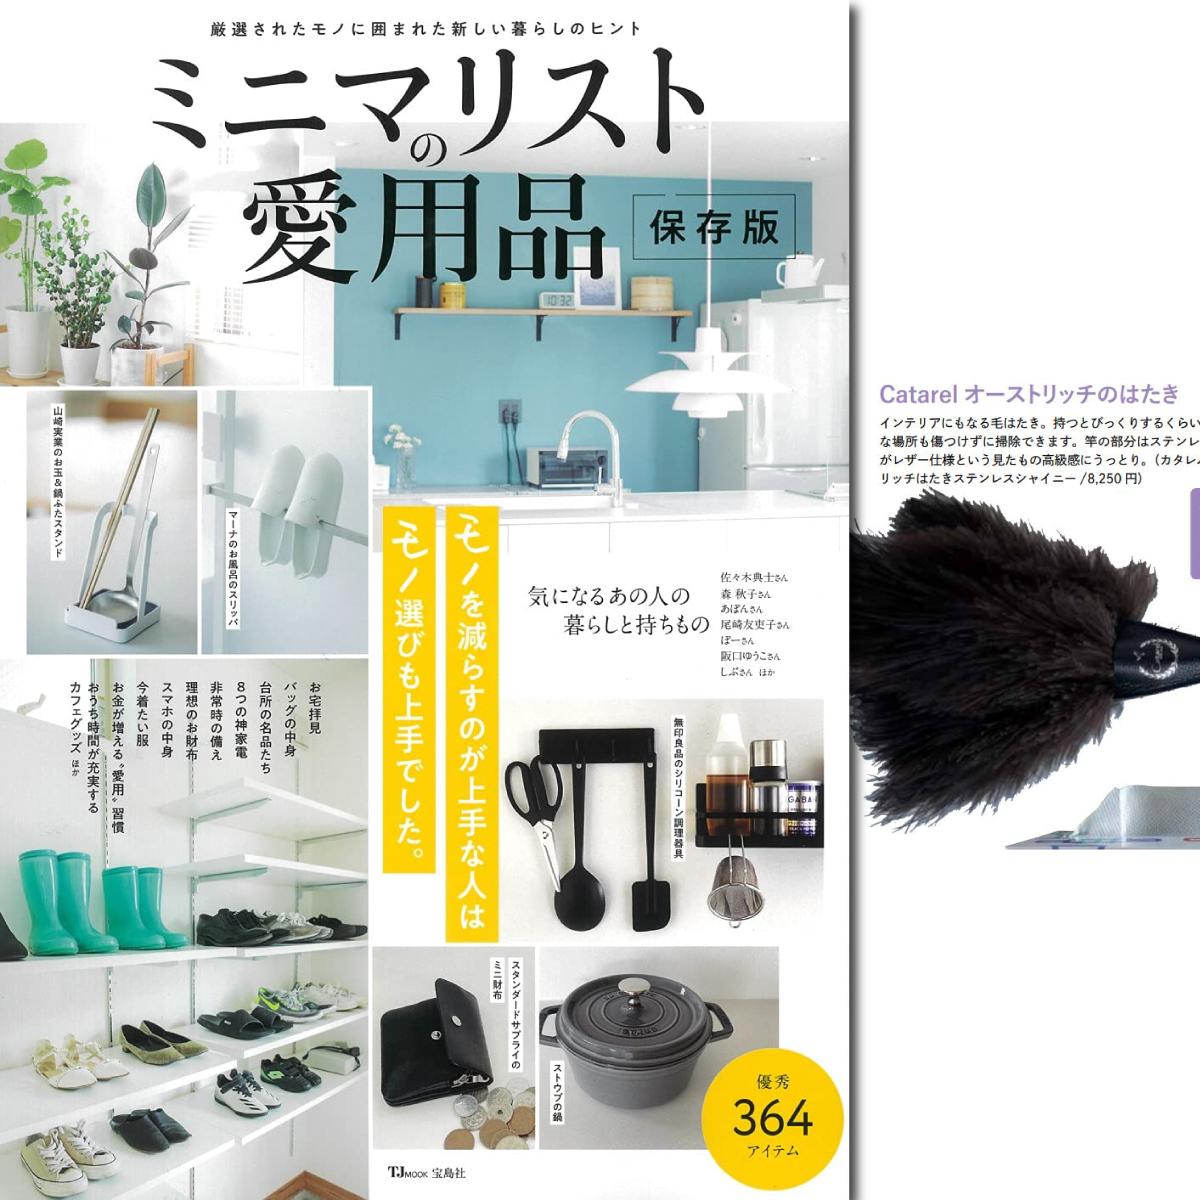 Catarel(カタレル) + 宝島社『ミニマリストの愛用品』